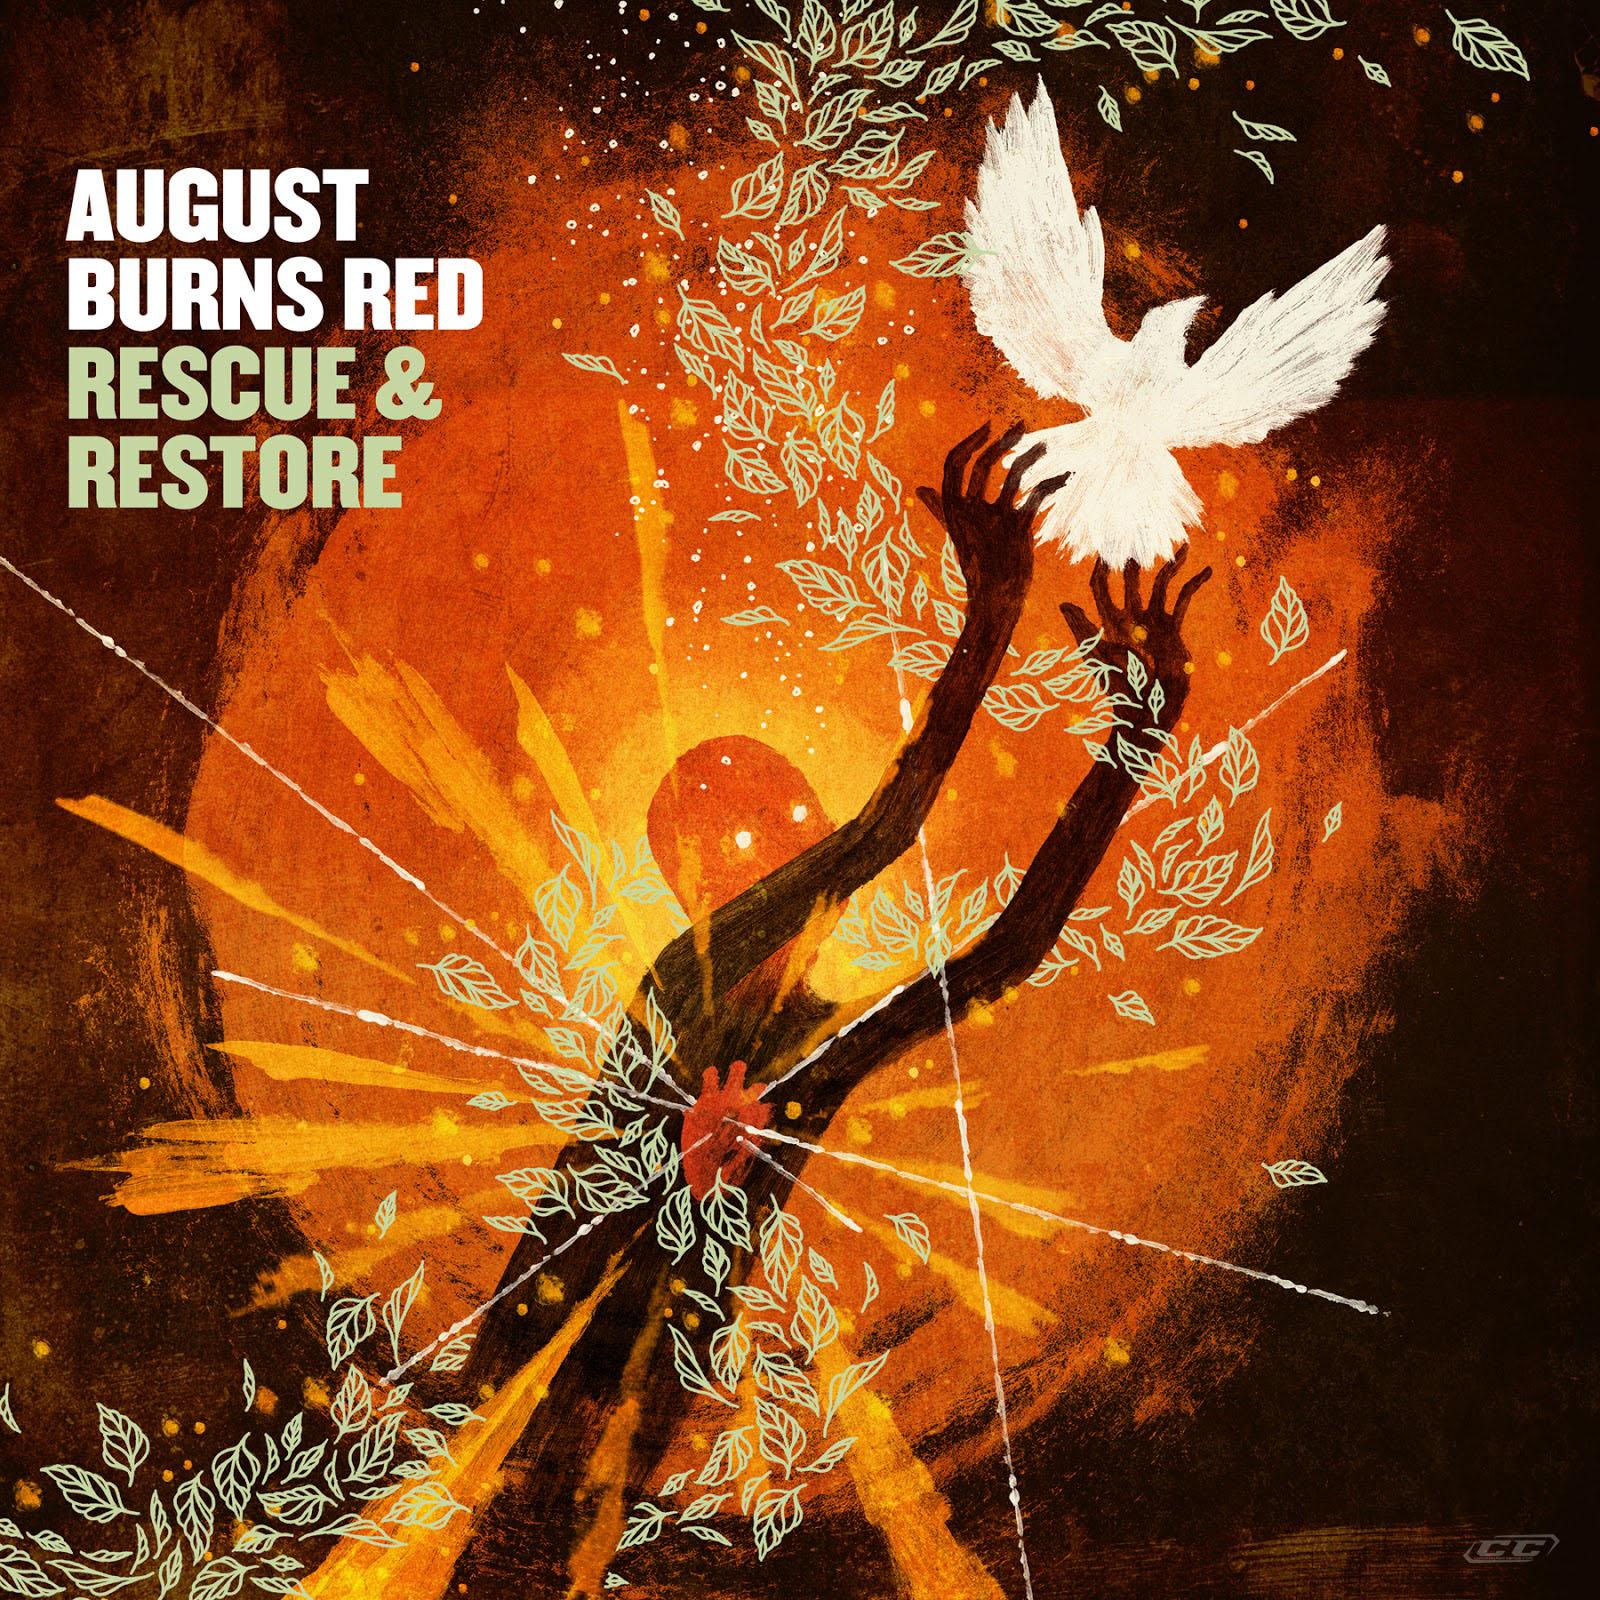 August-Burns-Red--Rescue-&-Restore-2013-English-Christian-Album-Download